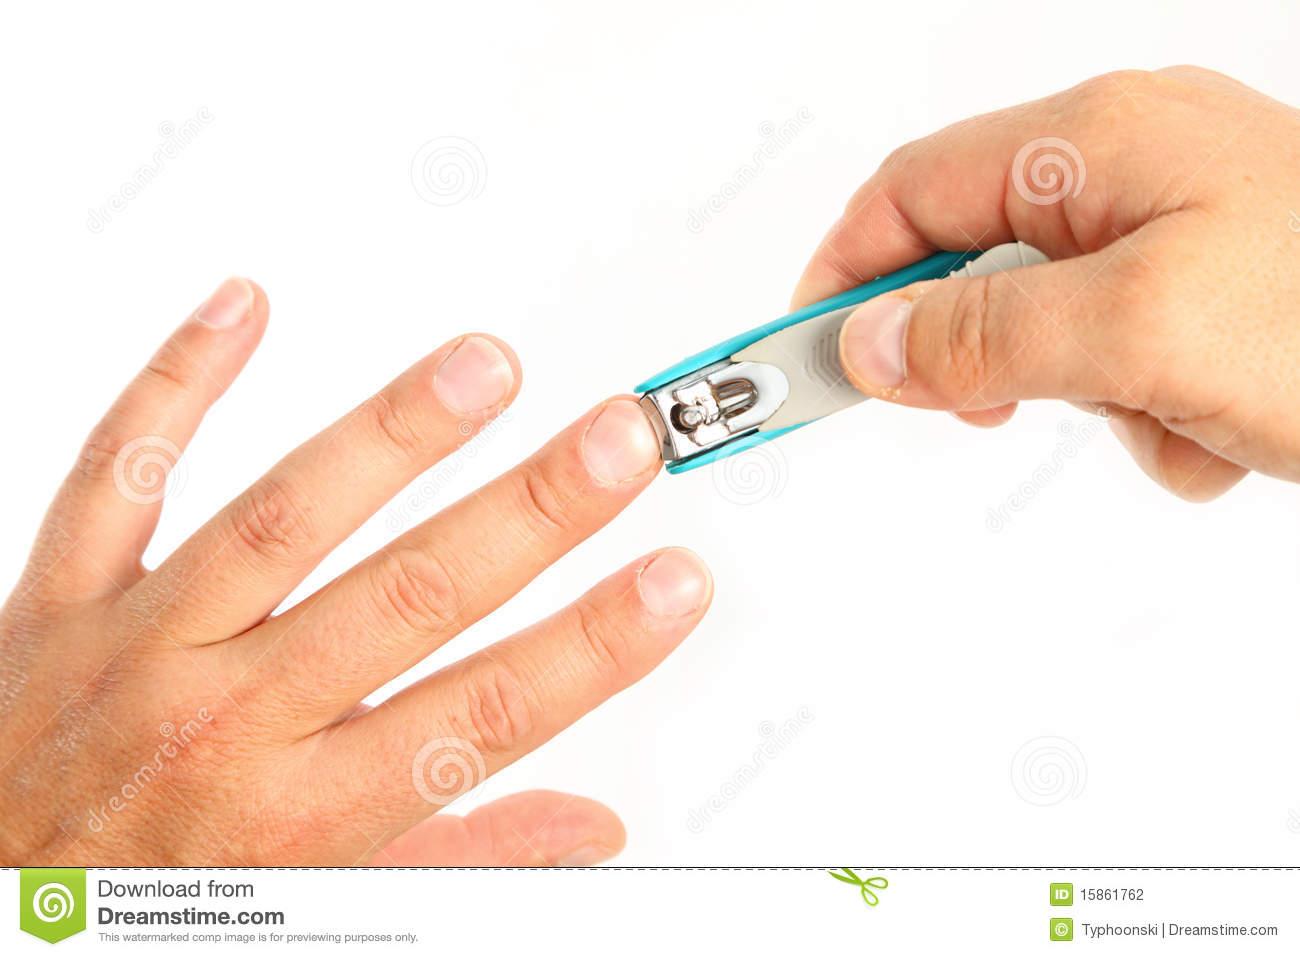 Finger clip art black. Nails clipart short nail